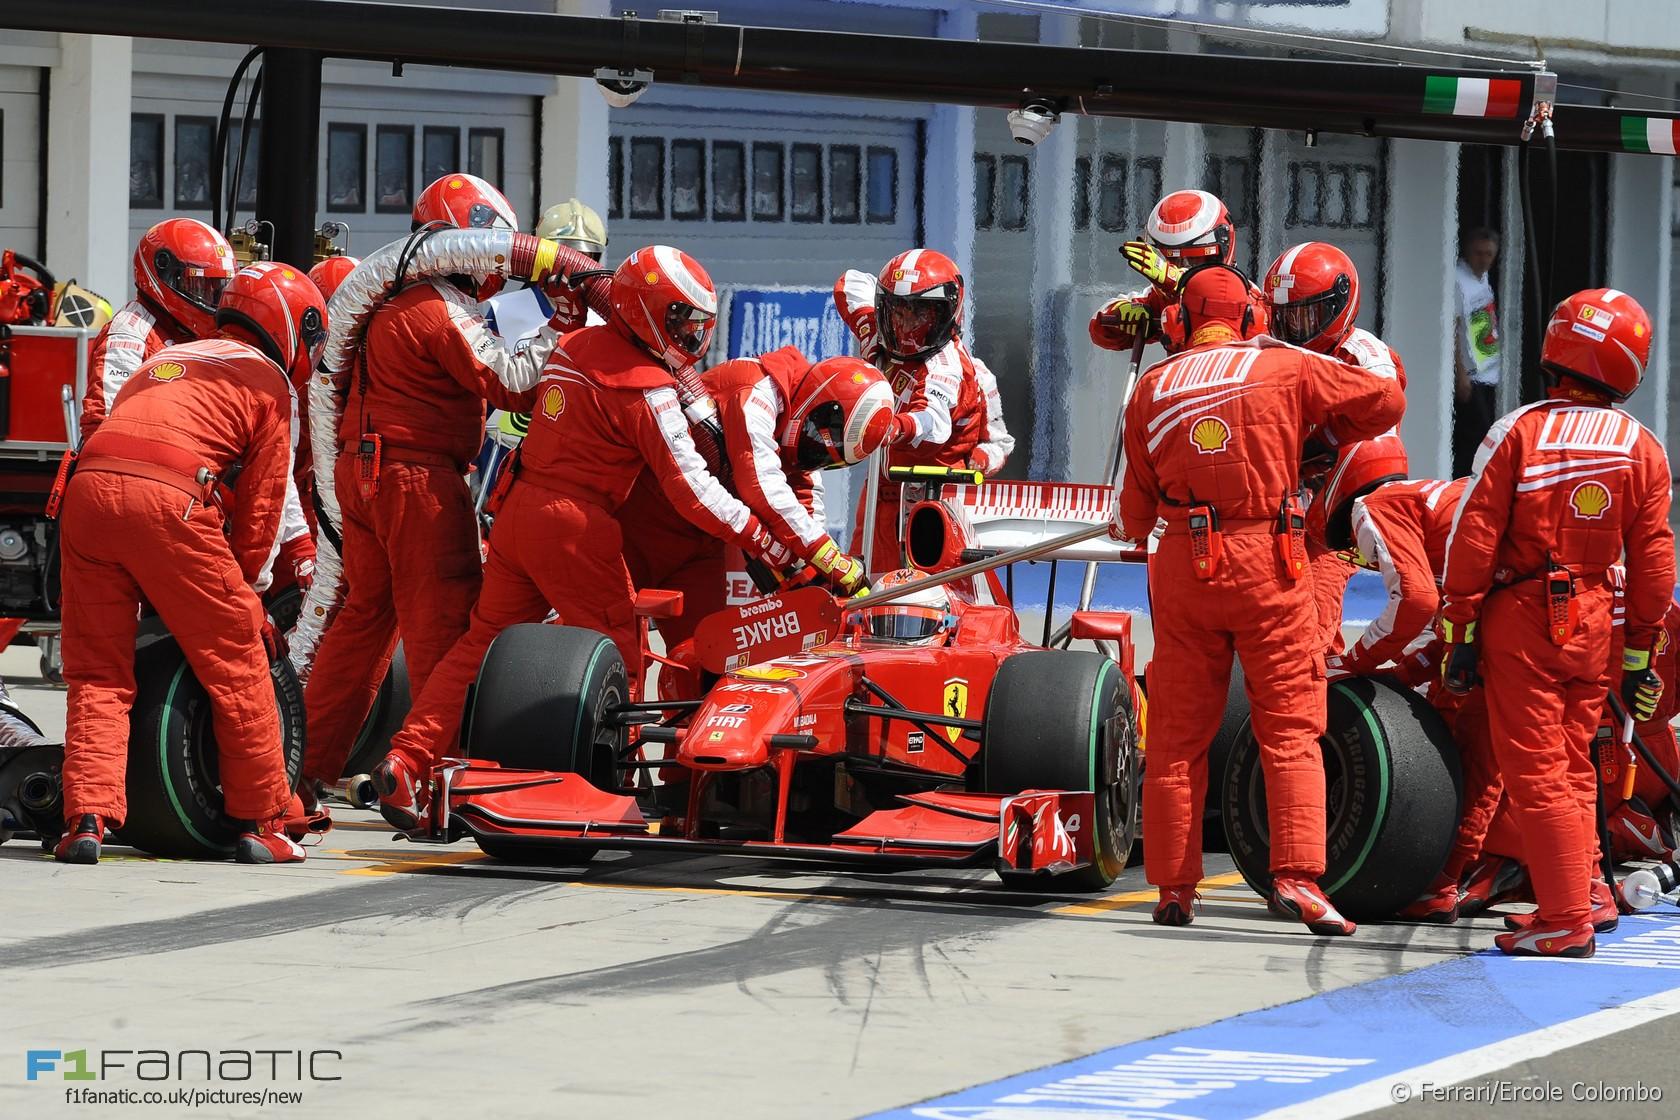 Kimi Raikkonen, Ferrari, Hungaroring, 2009